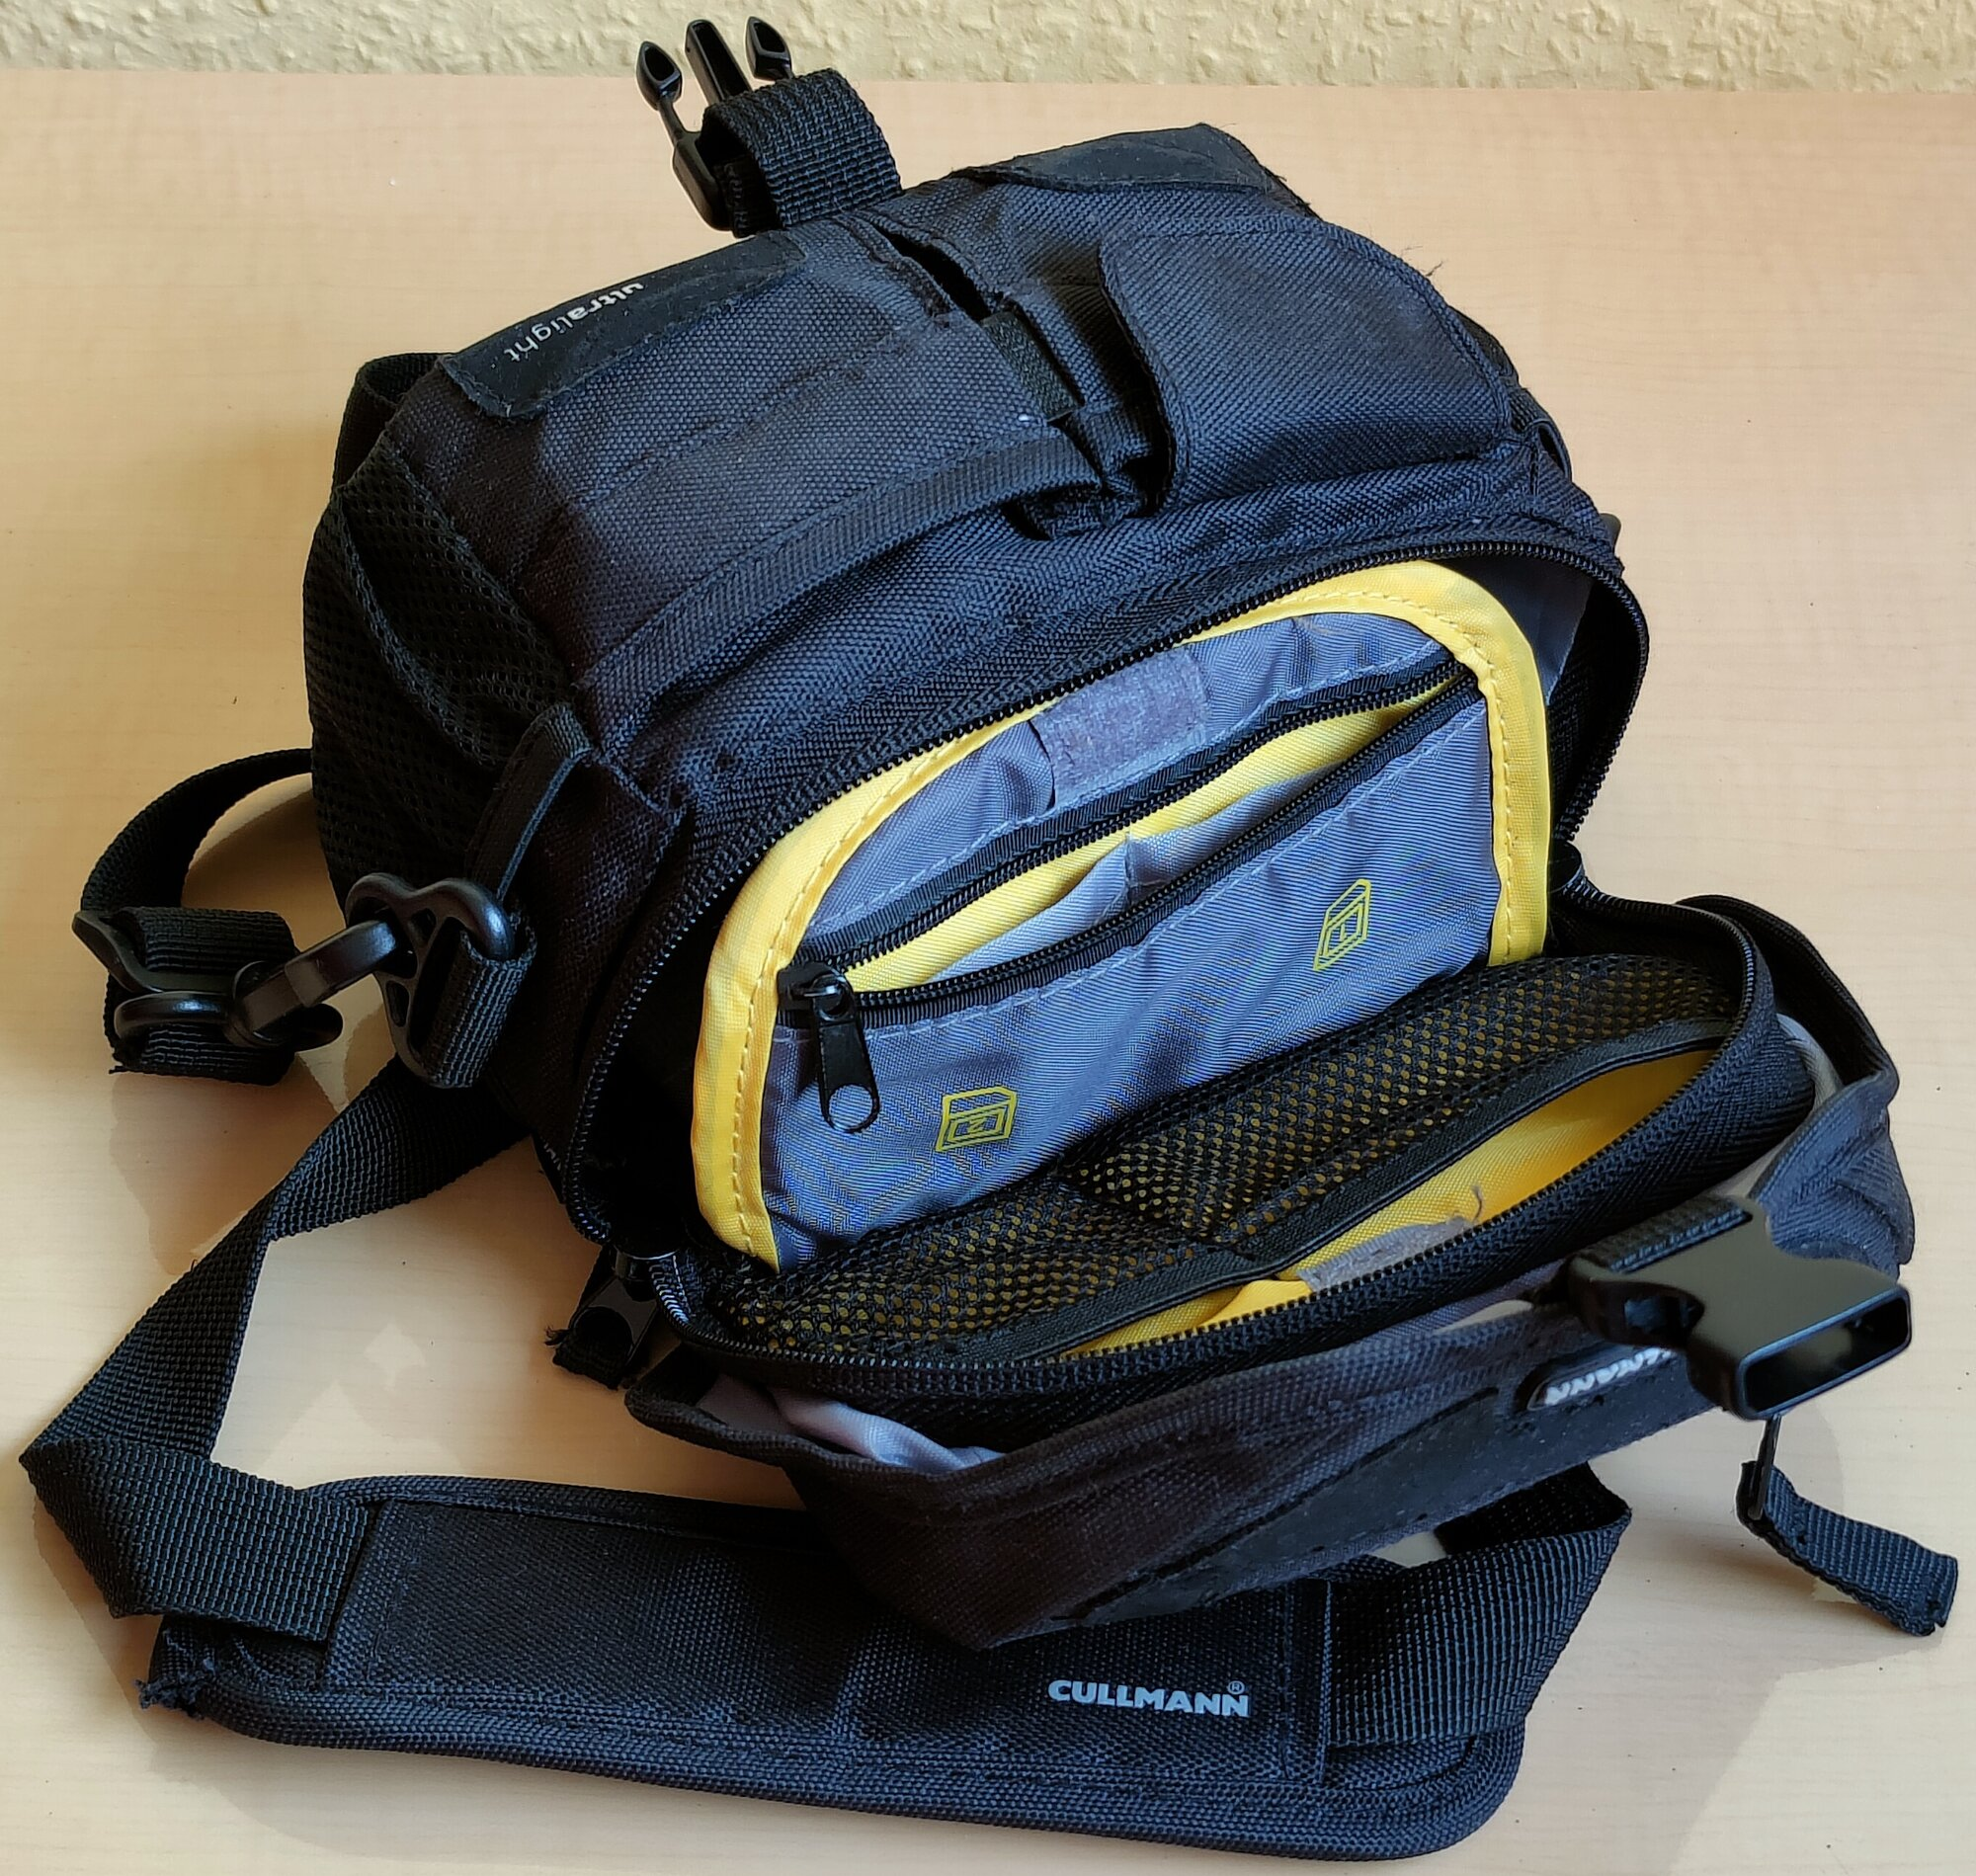 X100 - 09 - Cullmann-Tasche Ultralight CP Vario 200.jpg